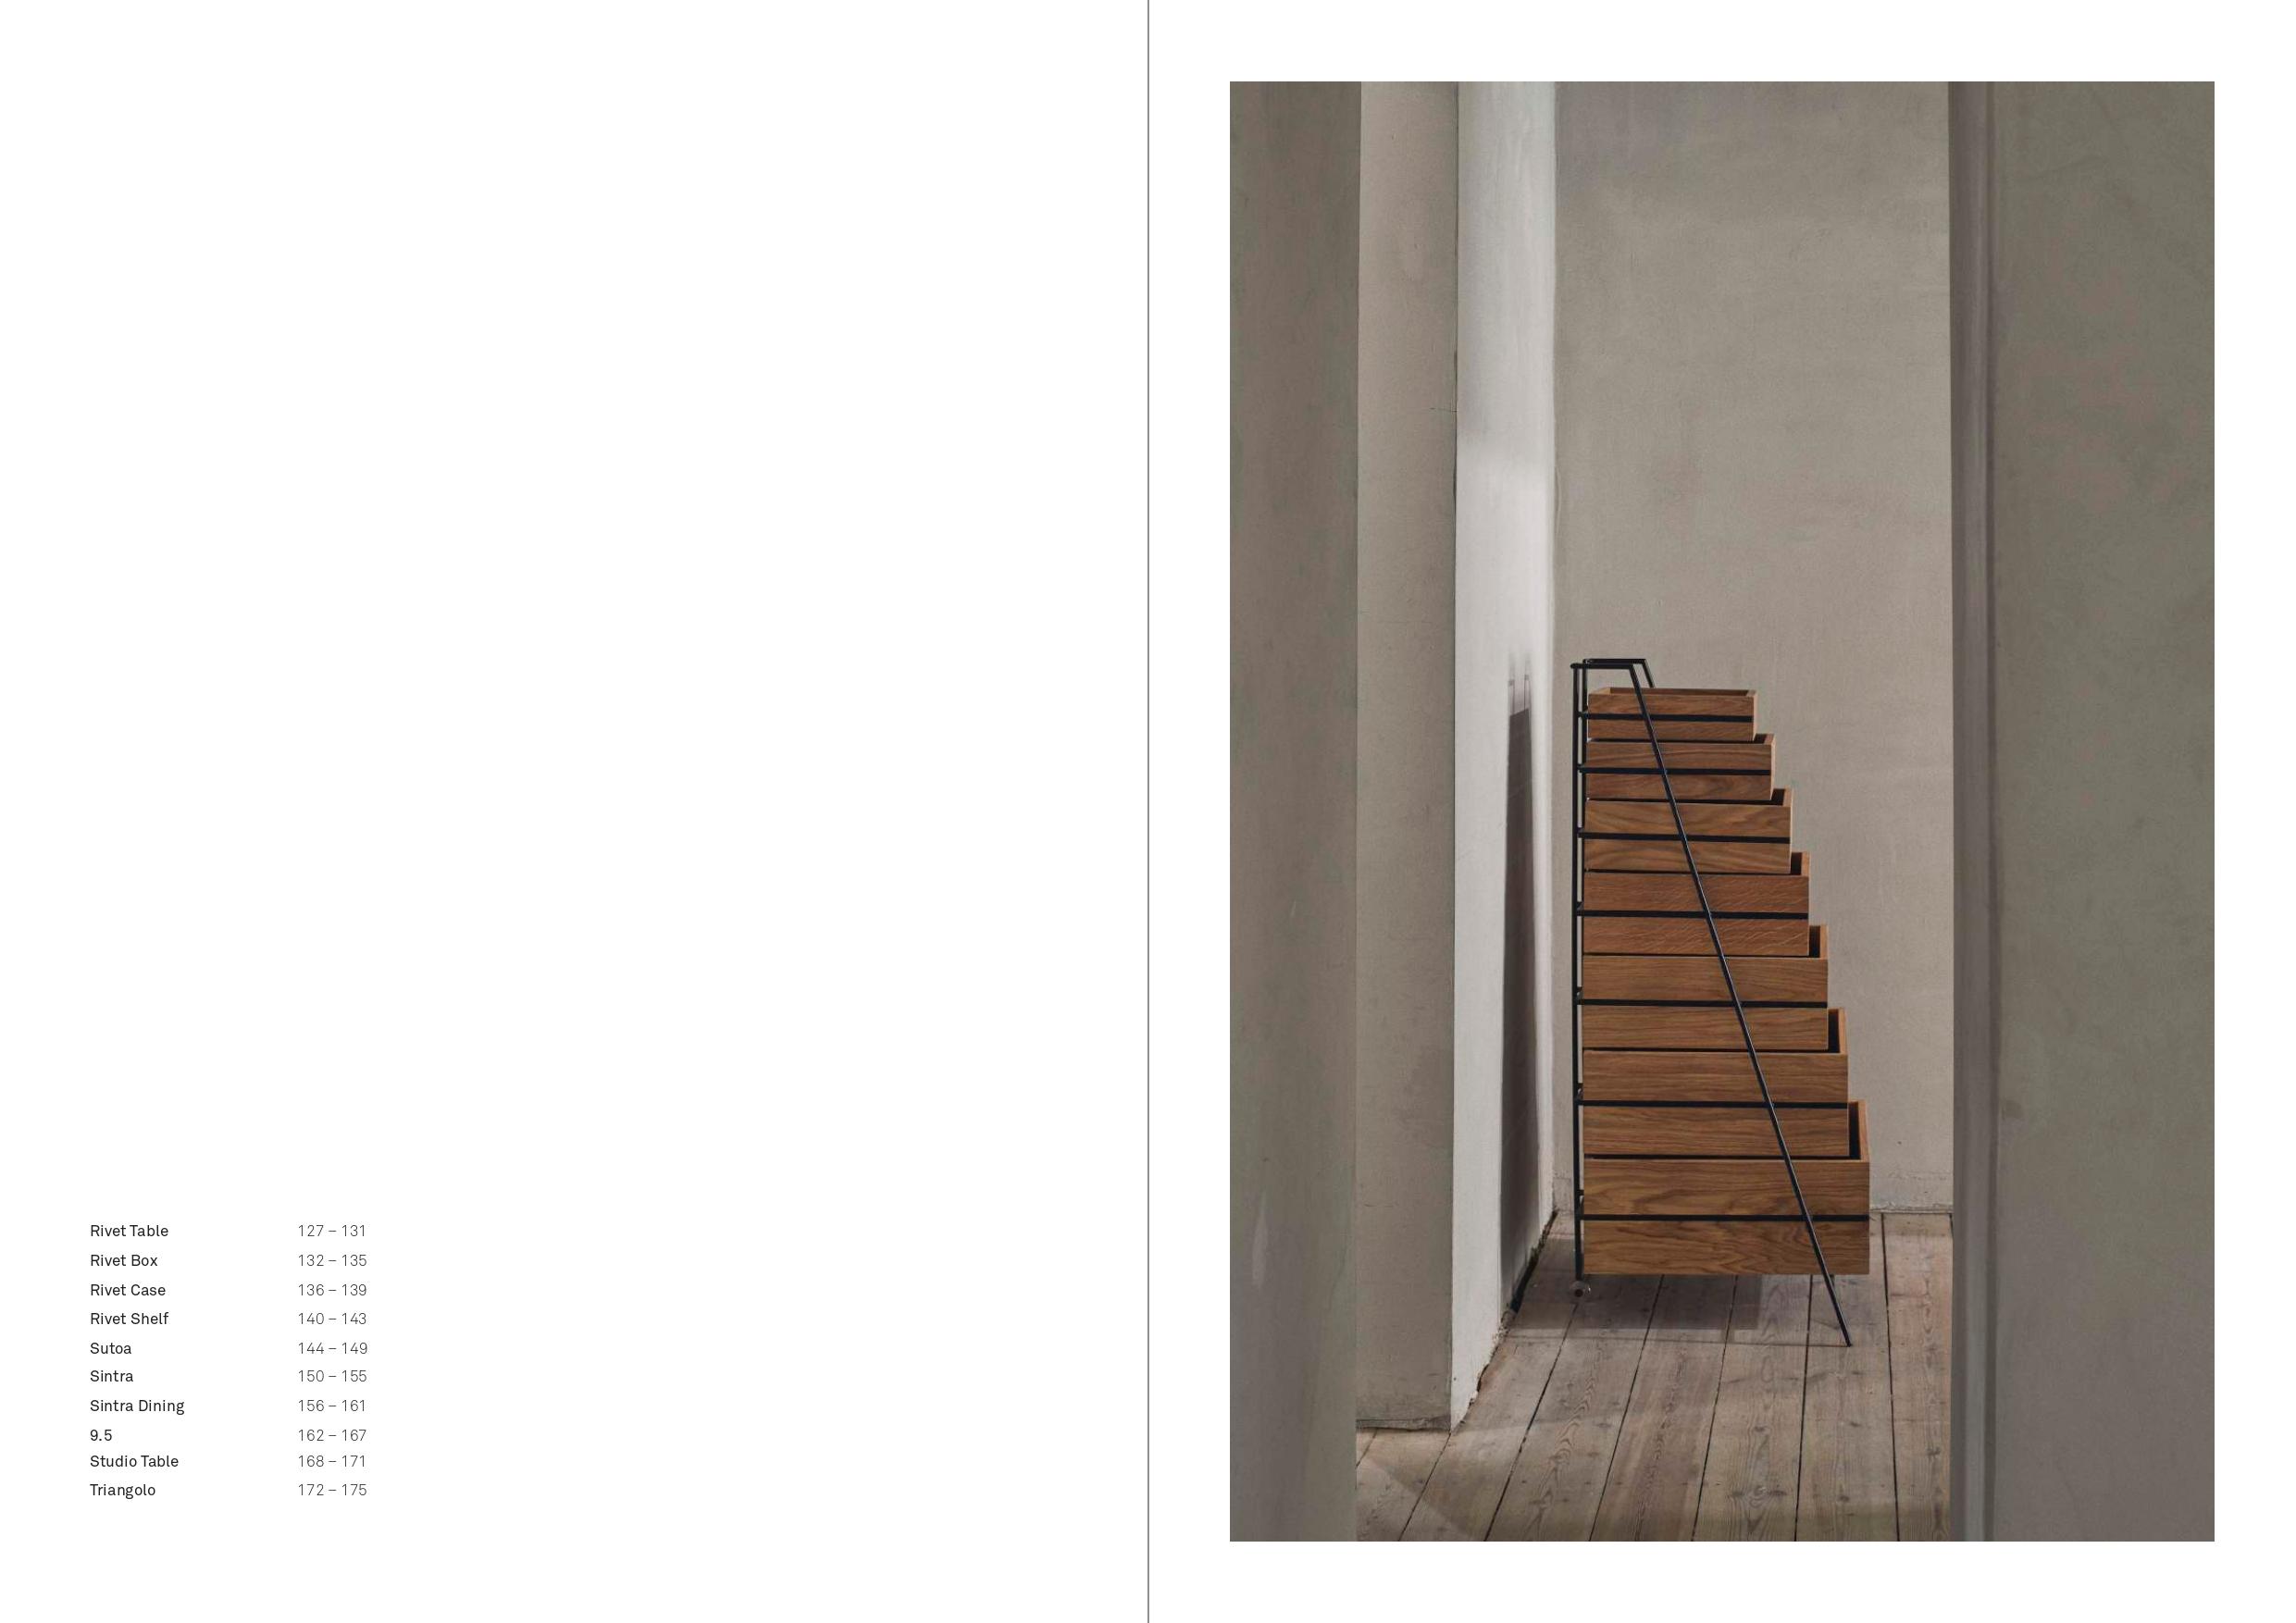 Frama l 2019 l general catalogue_page-0063.jpg